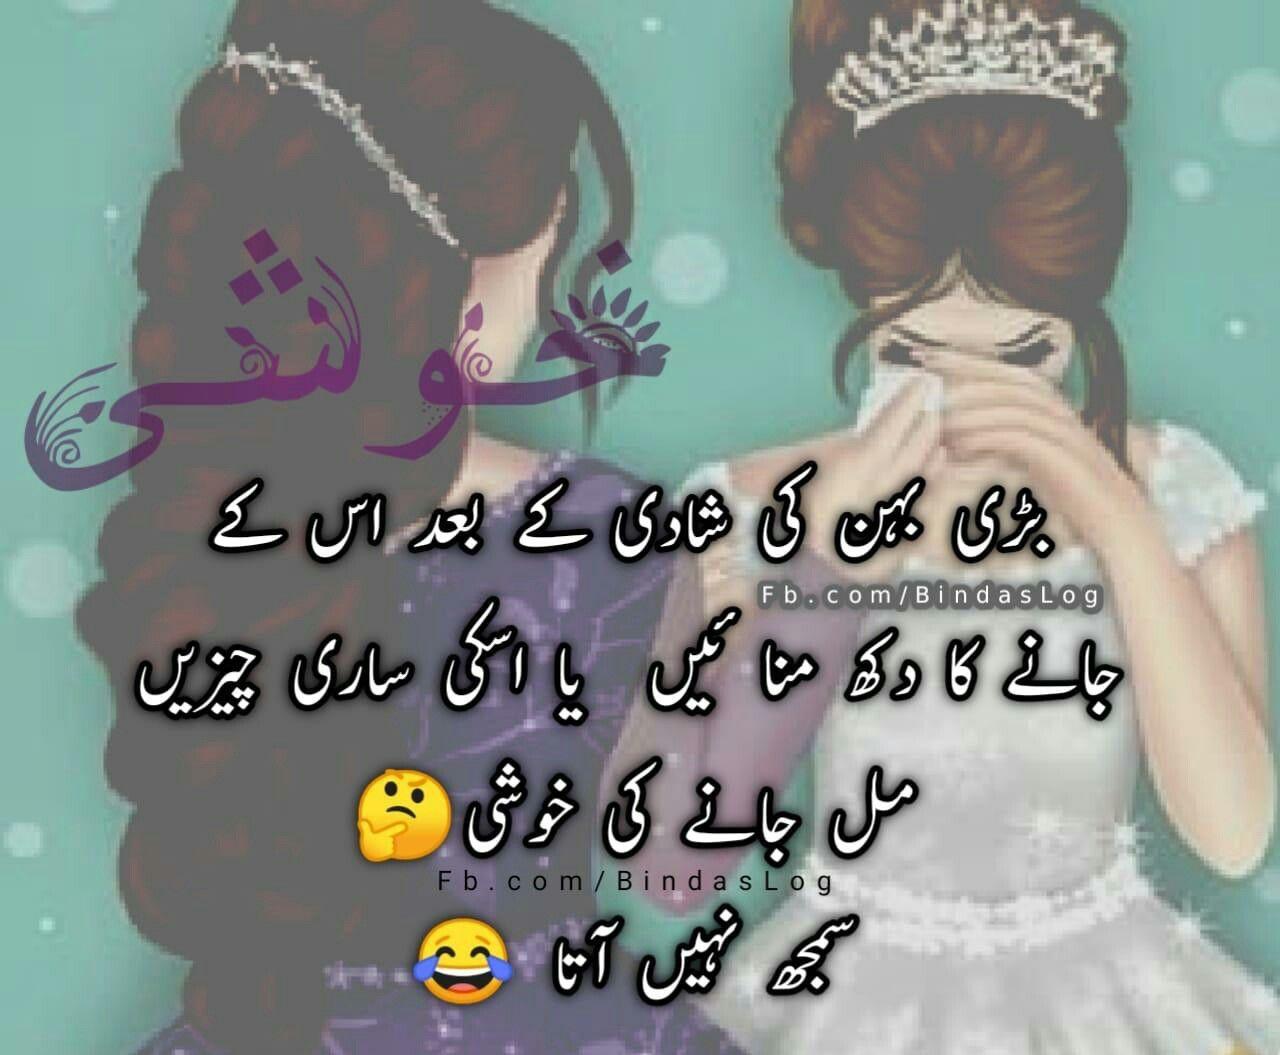 Pin By Zaini Queen On Lirkiyo Ki Batee Fun Quotes Funny Sister Quotes Funny Funny Quotes